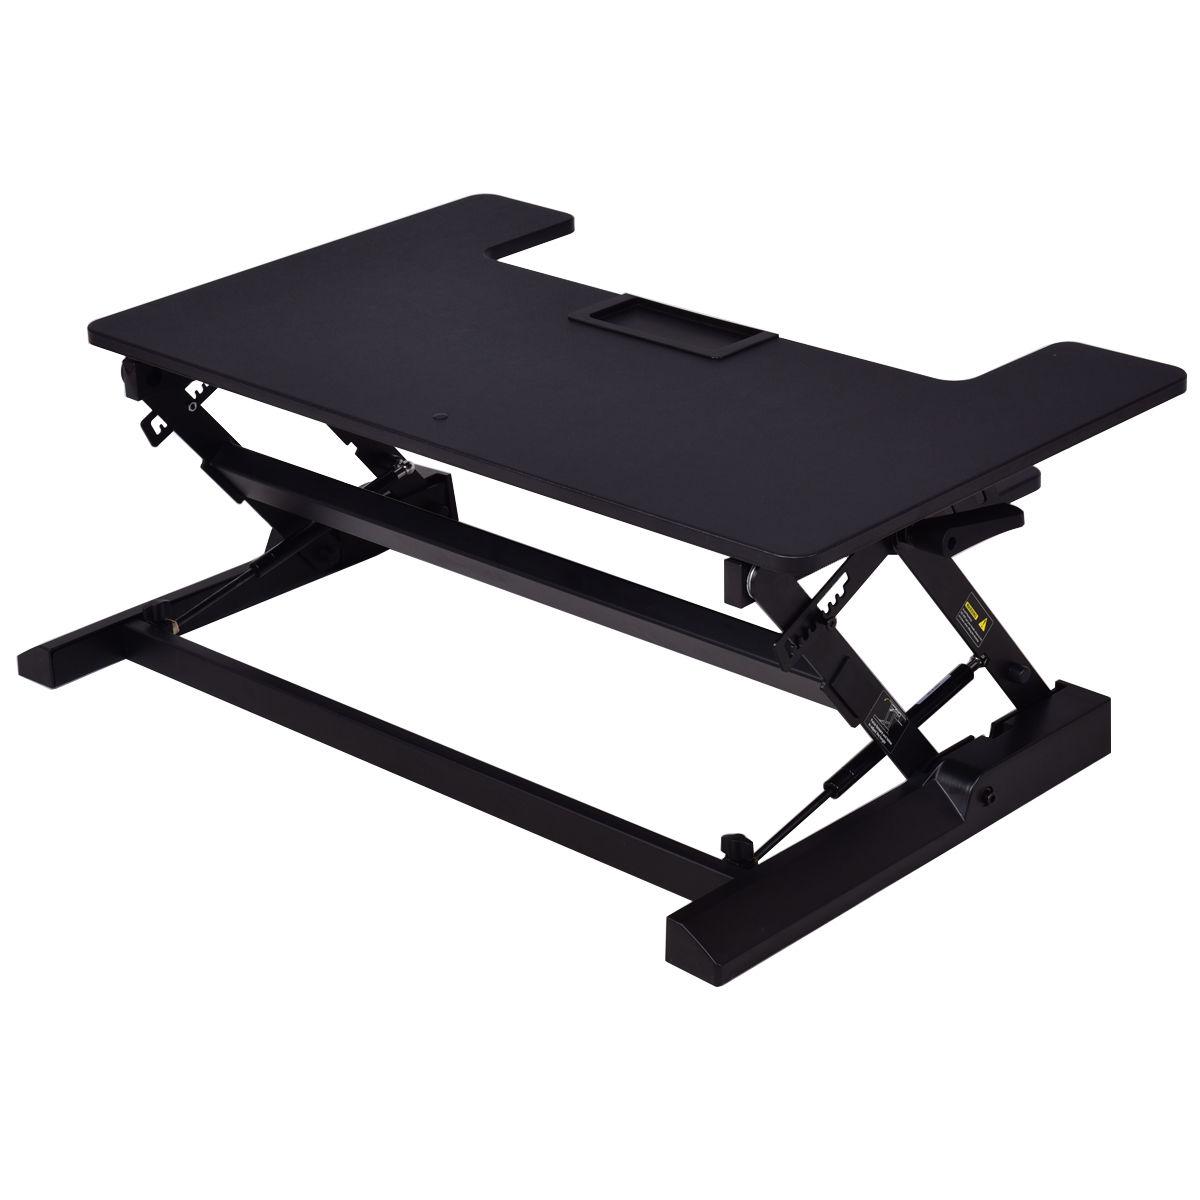 Height Adjustable Lift Rising Laptop Desk with Pen Slot HW56304